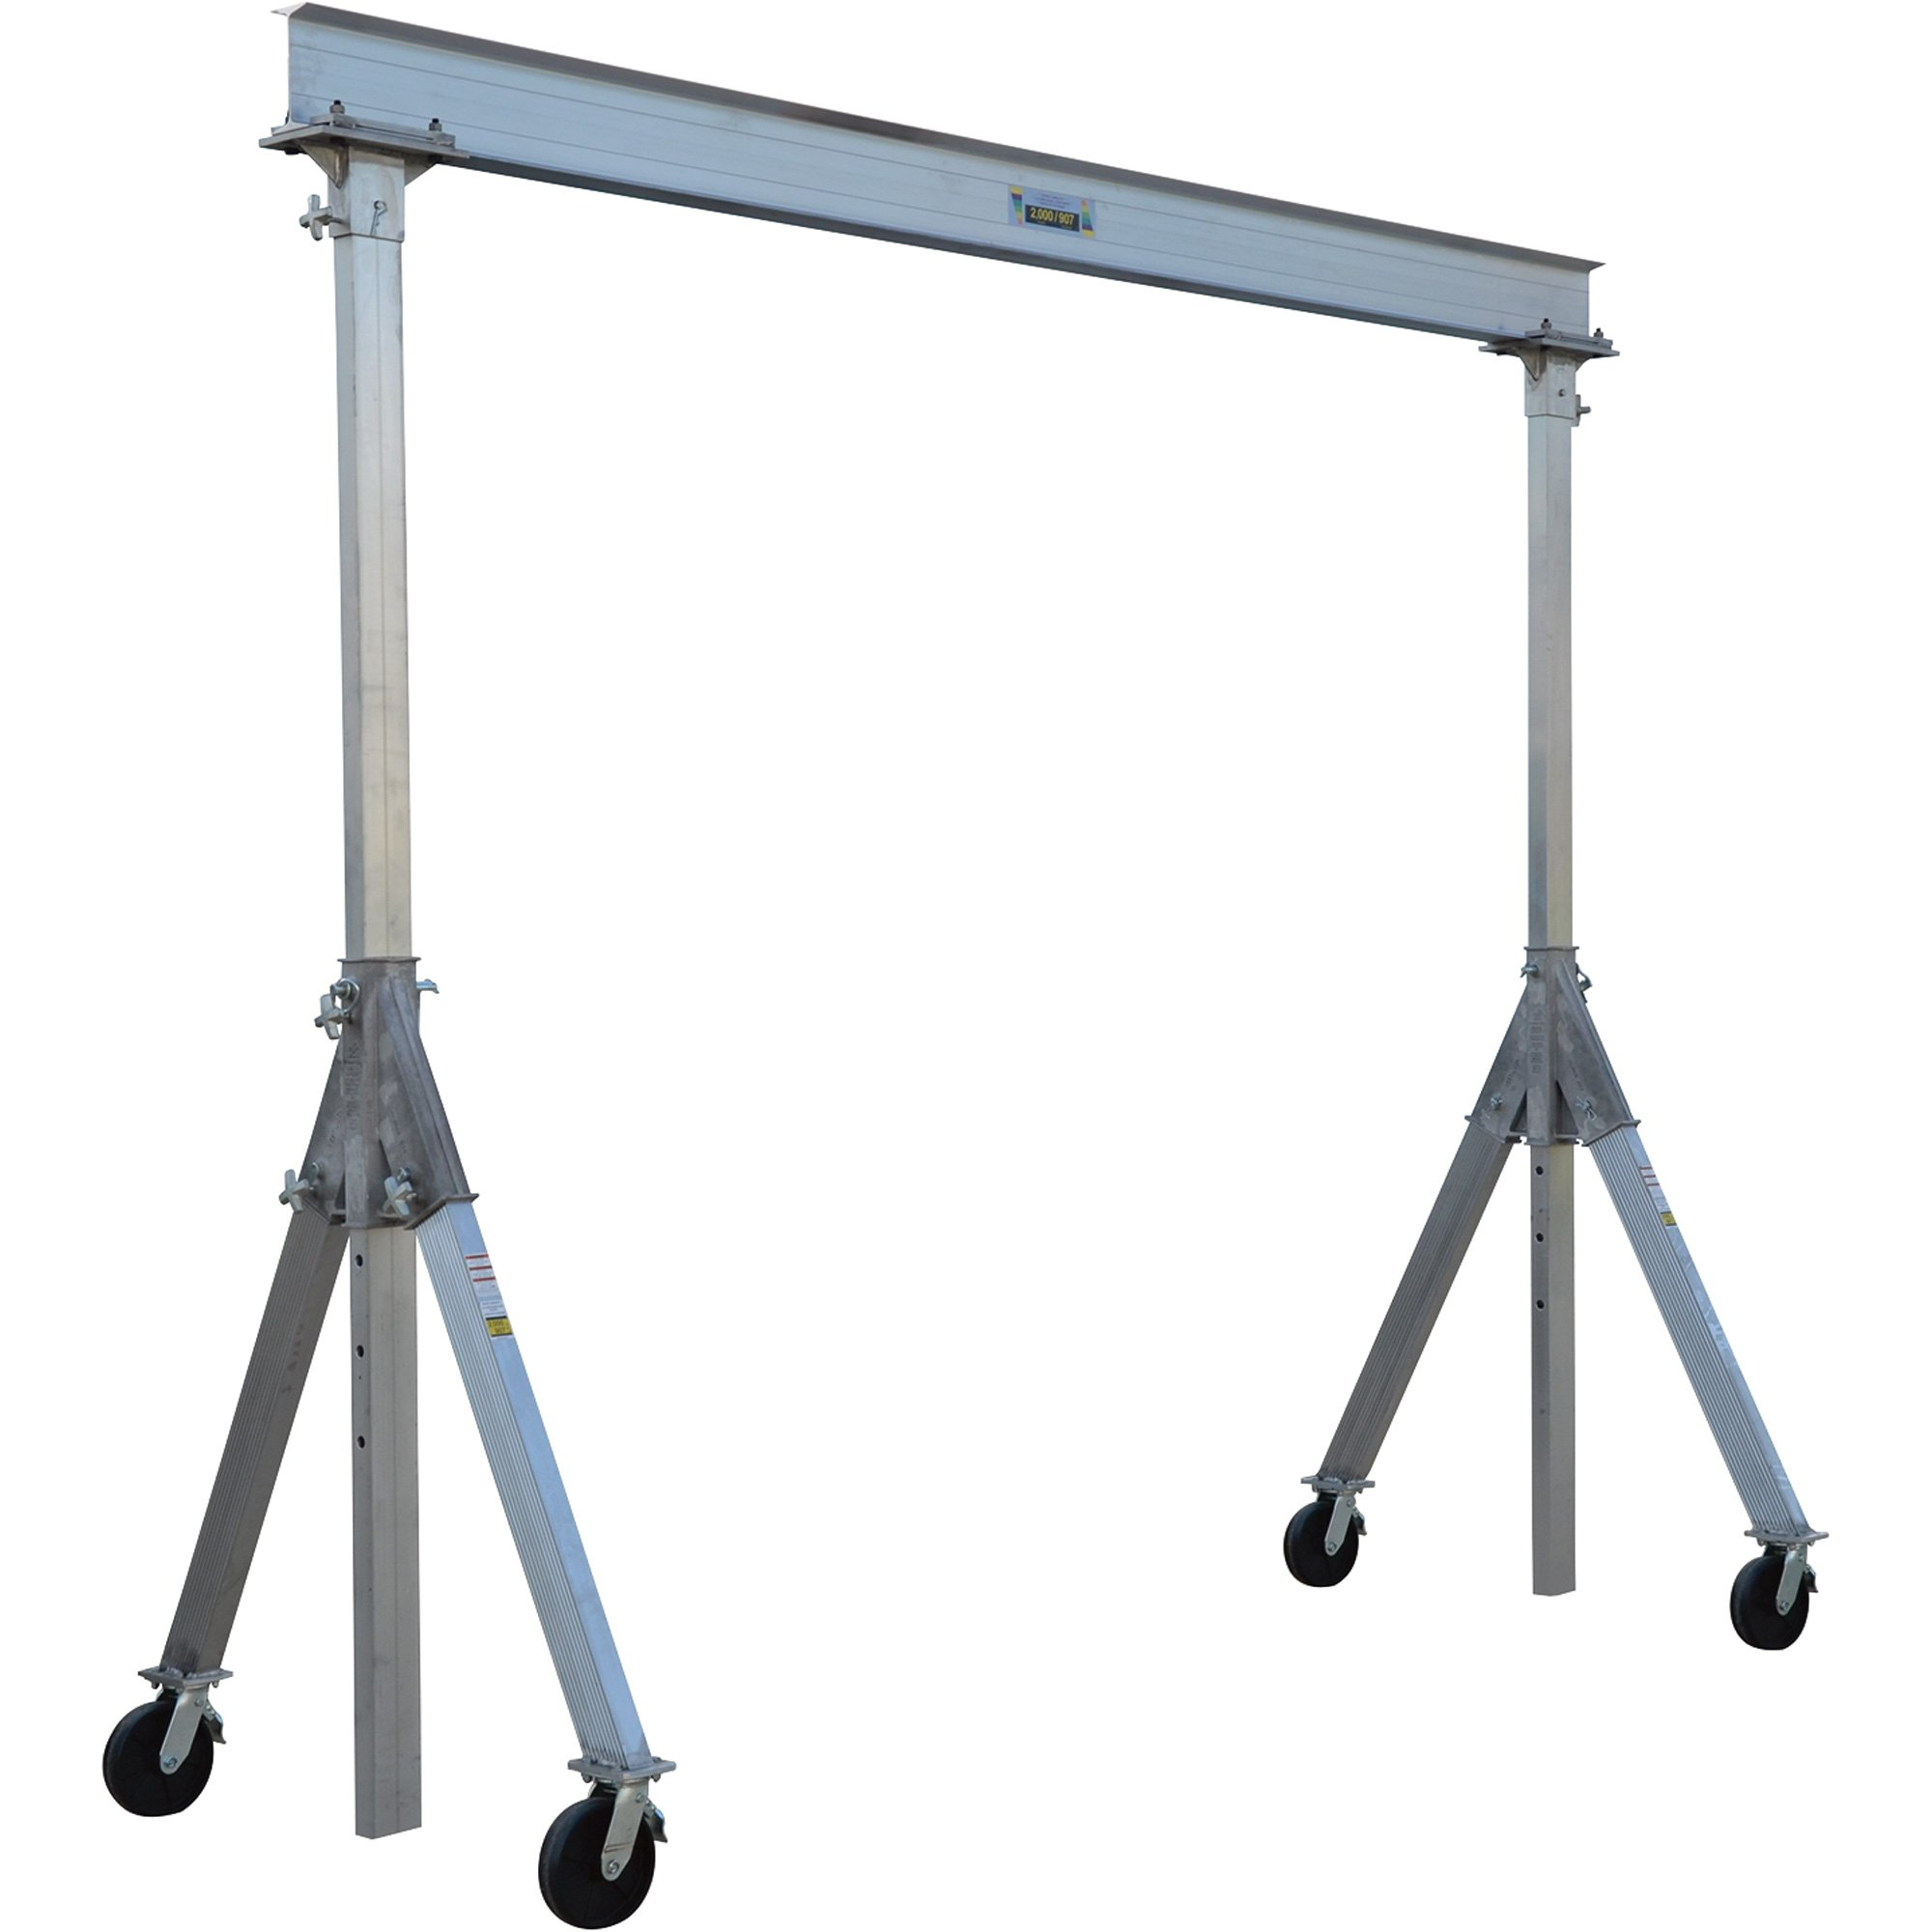 Vestil AHA-6-15-10 Aluminum Adjustable Gantry Crane, 6000 lb. Capacity, 15' Overall Beam, 96'' Usable Trolley Travel Distance, Under I-Beam Range 98''-120'', 134'' Height